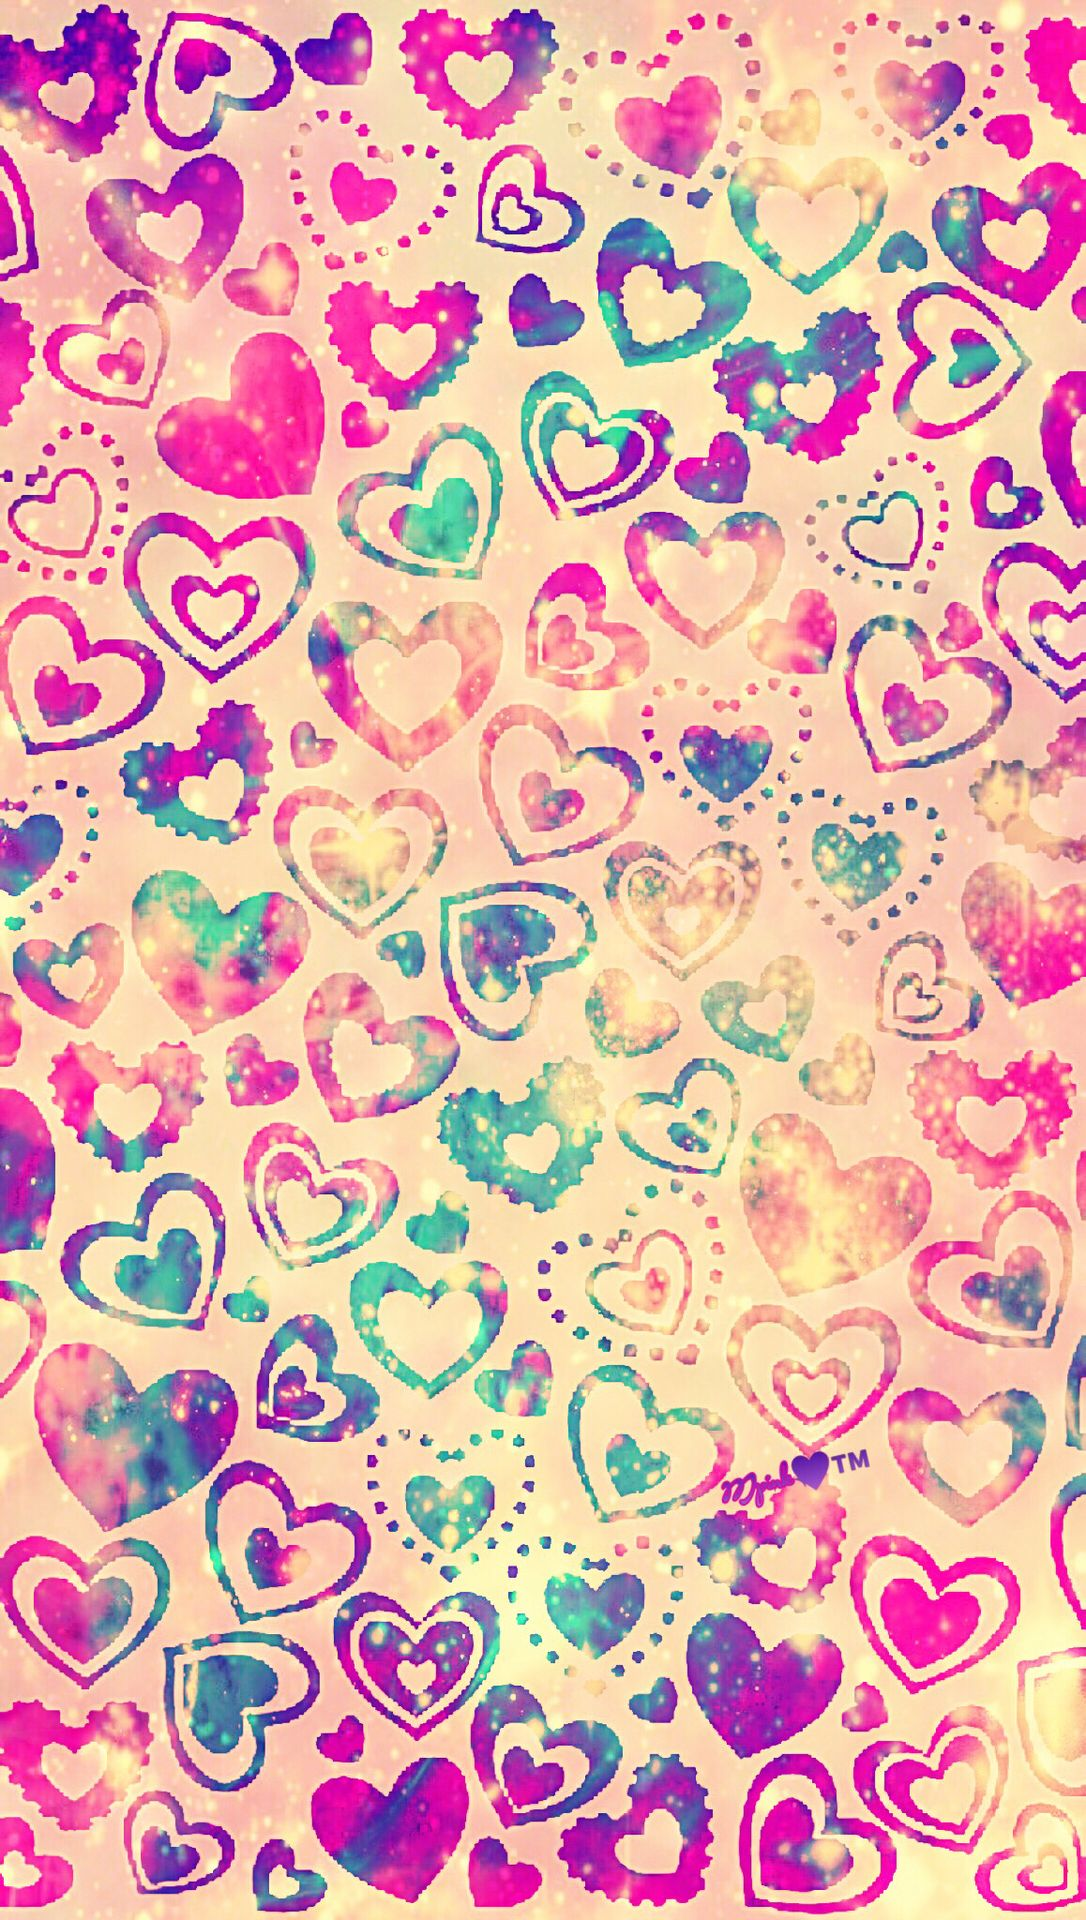 Candy Hearts Galaxy Wallpaper Androidwallpaper Iphonewallpaper